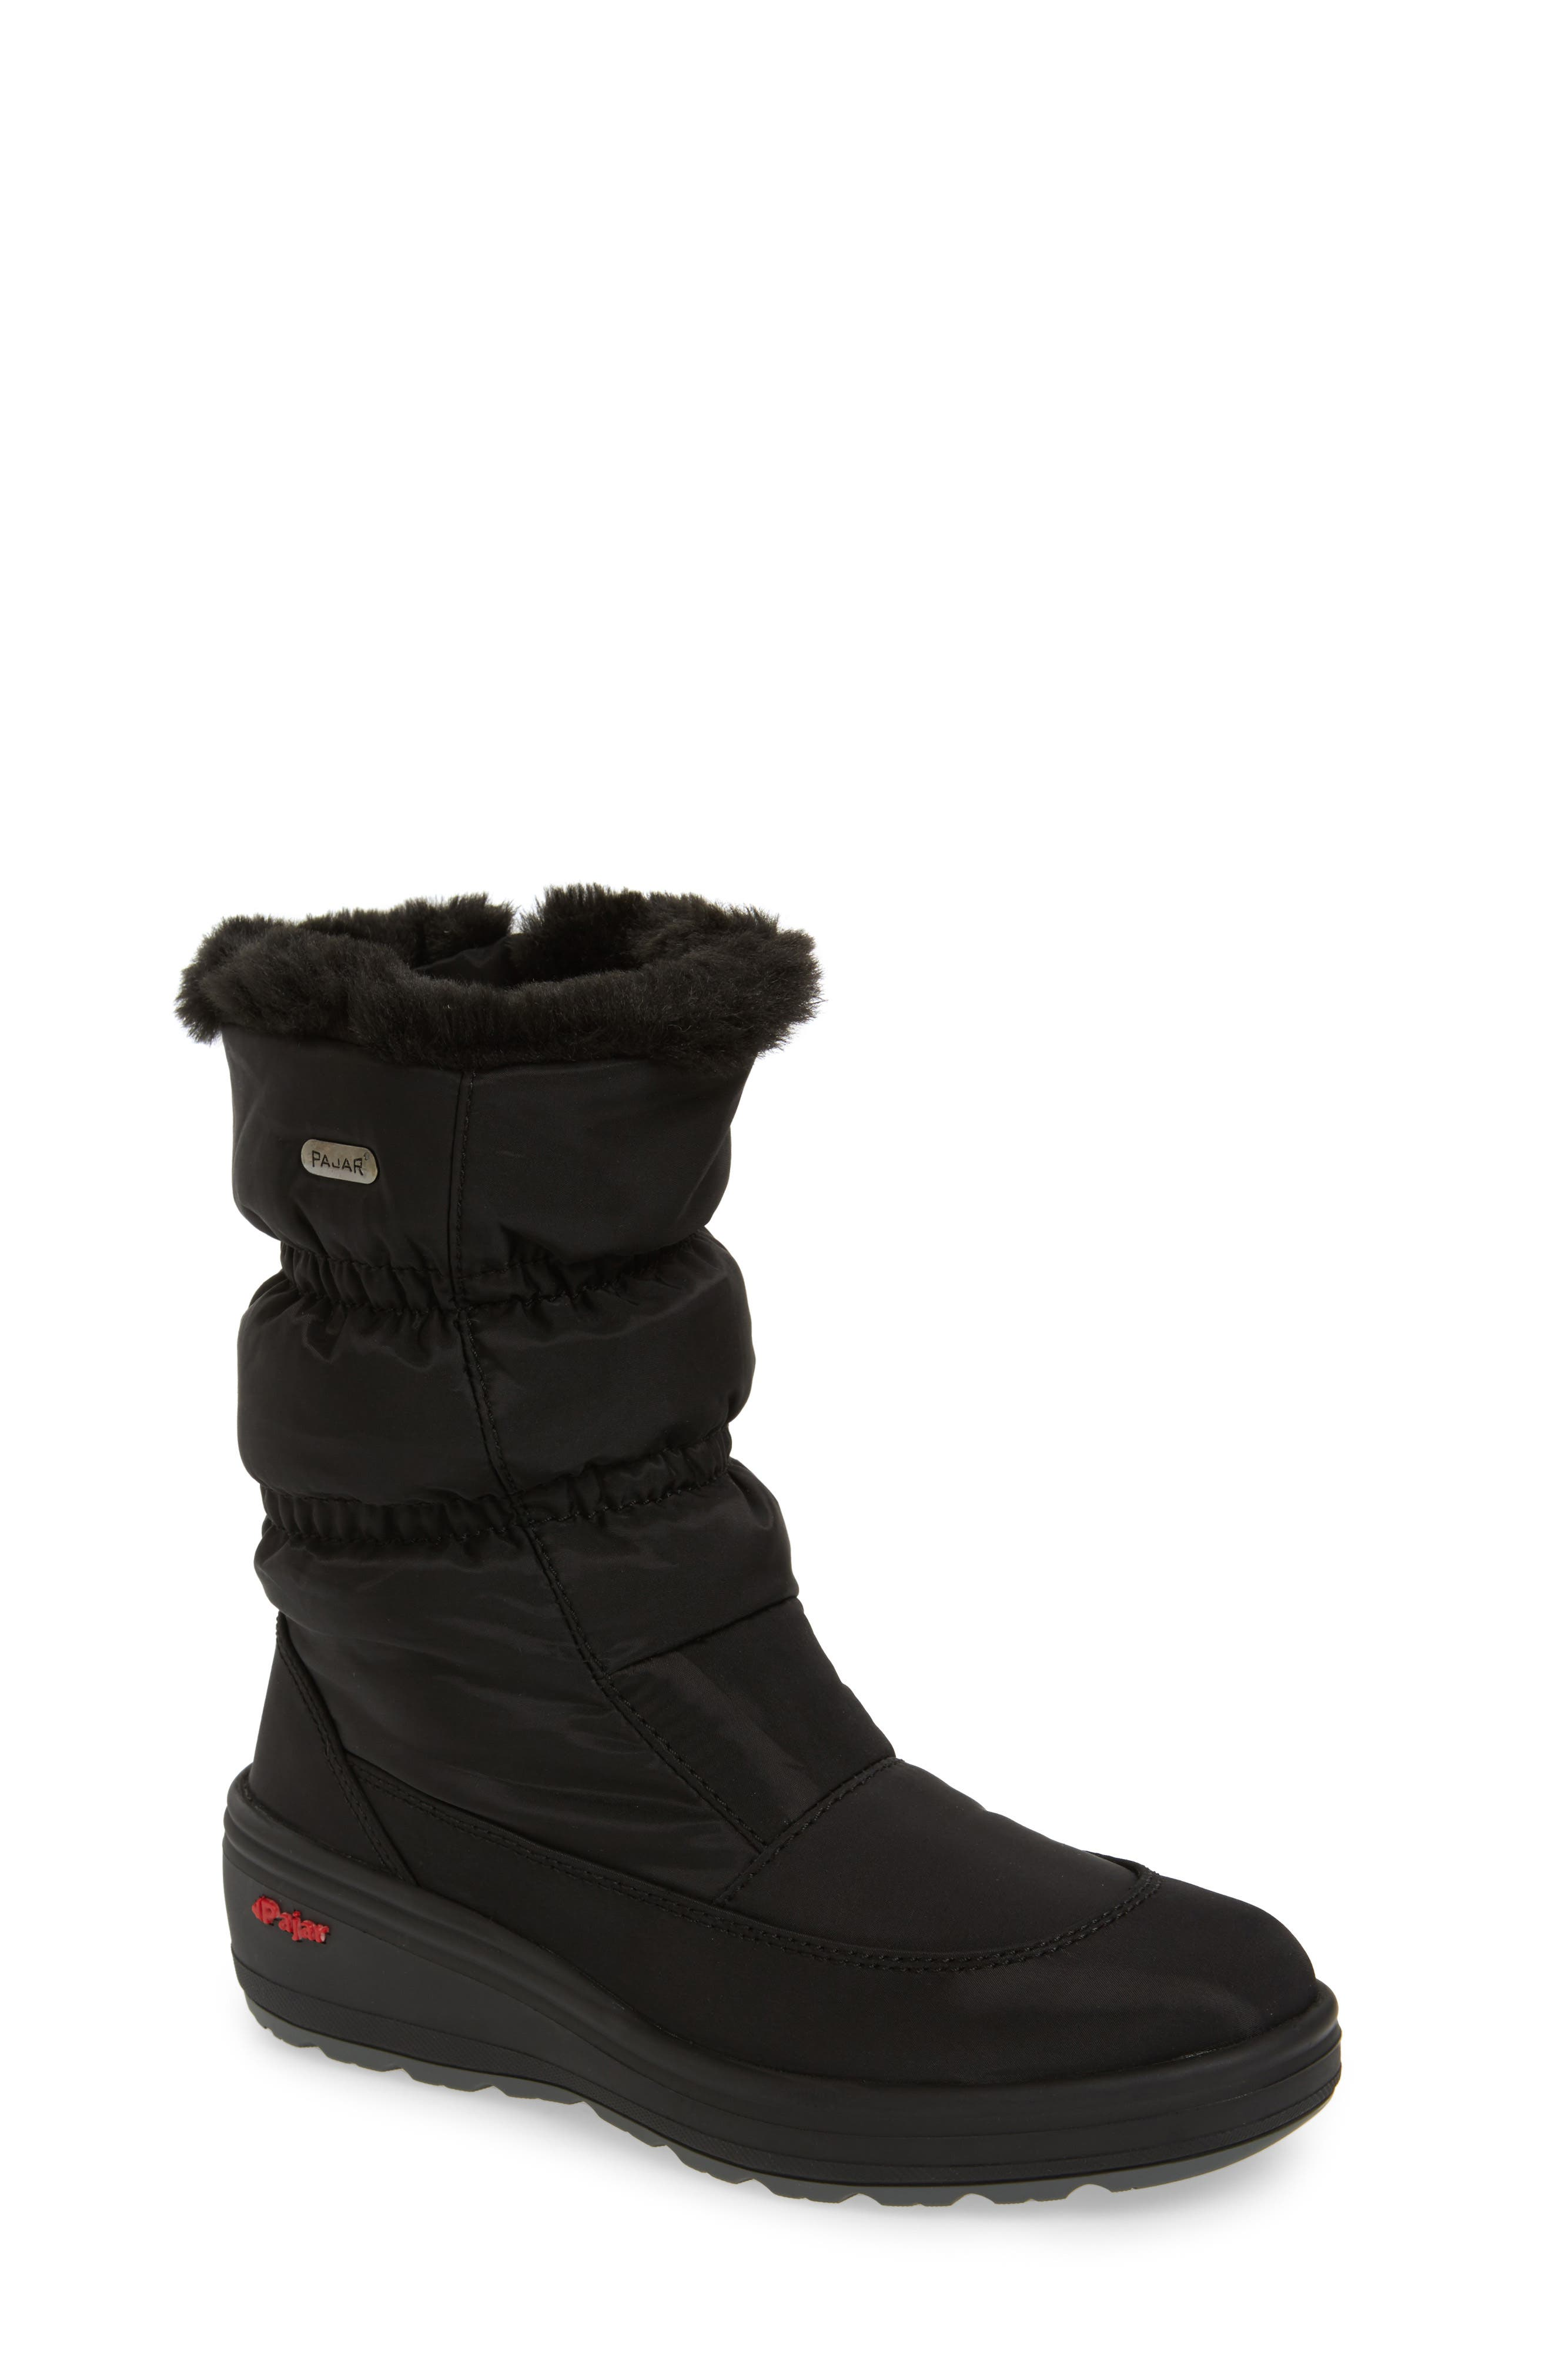 Pajar Snowcap Waterproof Insulated Winter Boot (Women)